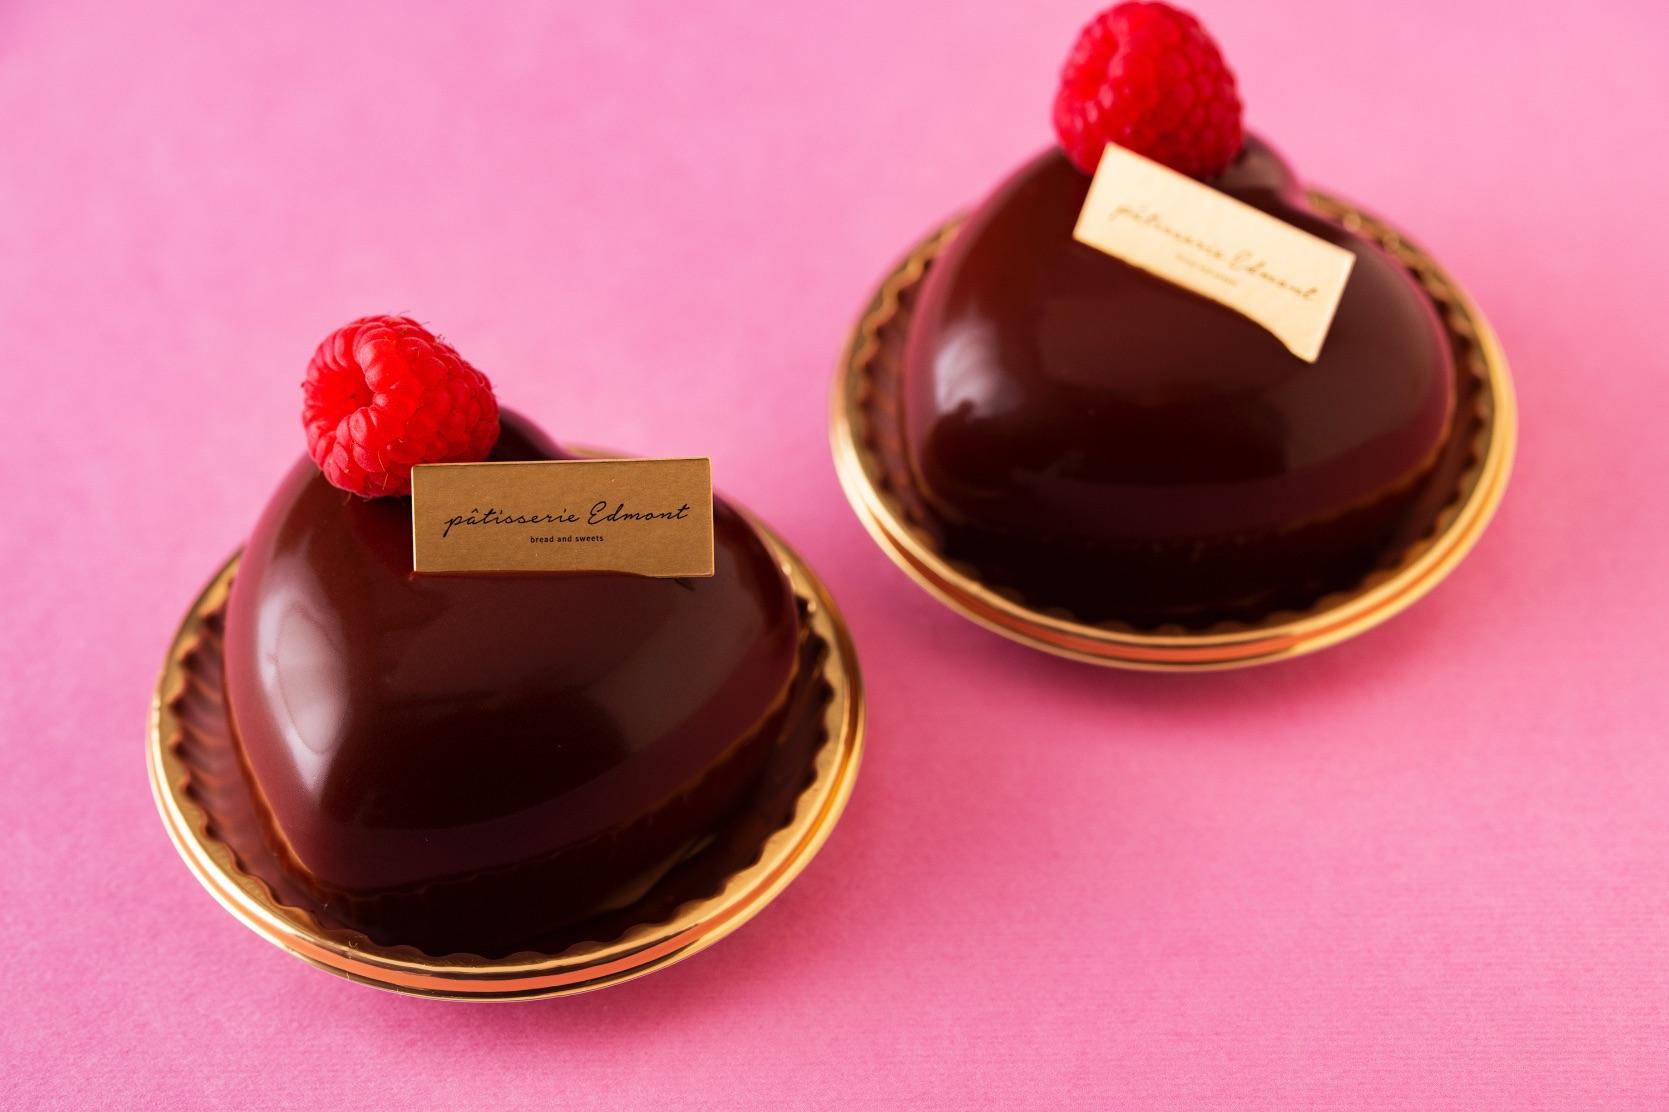 %e3%83%9b%e3%83%86%e3%83%ab%e3%83%a1%e3%83%88%e3%83%ad%e3%83%9d%e3%83%aa%e3%82%bf%e3%83%b3-%e3%82%a8%e3%83%89%e3%83%a2%e3%83%b3%e3%83%88valentines-chocolates-%e7%94%9c%e9%bb%9e__5-2